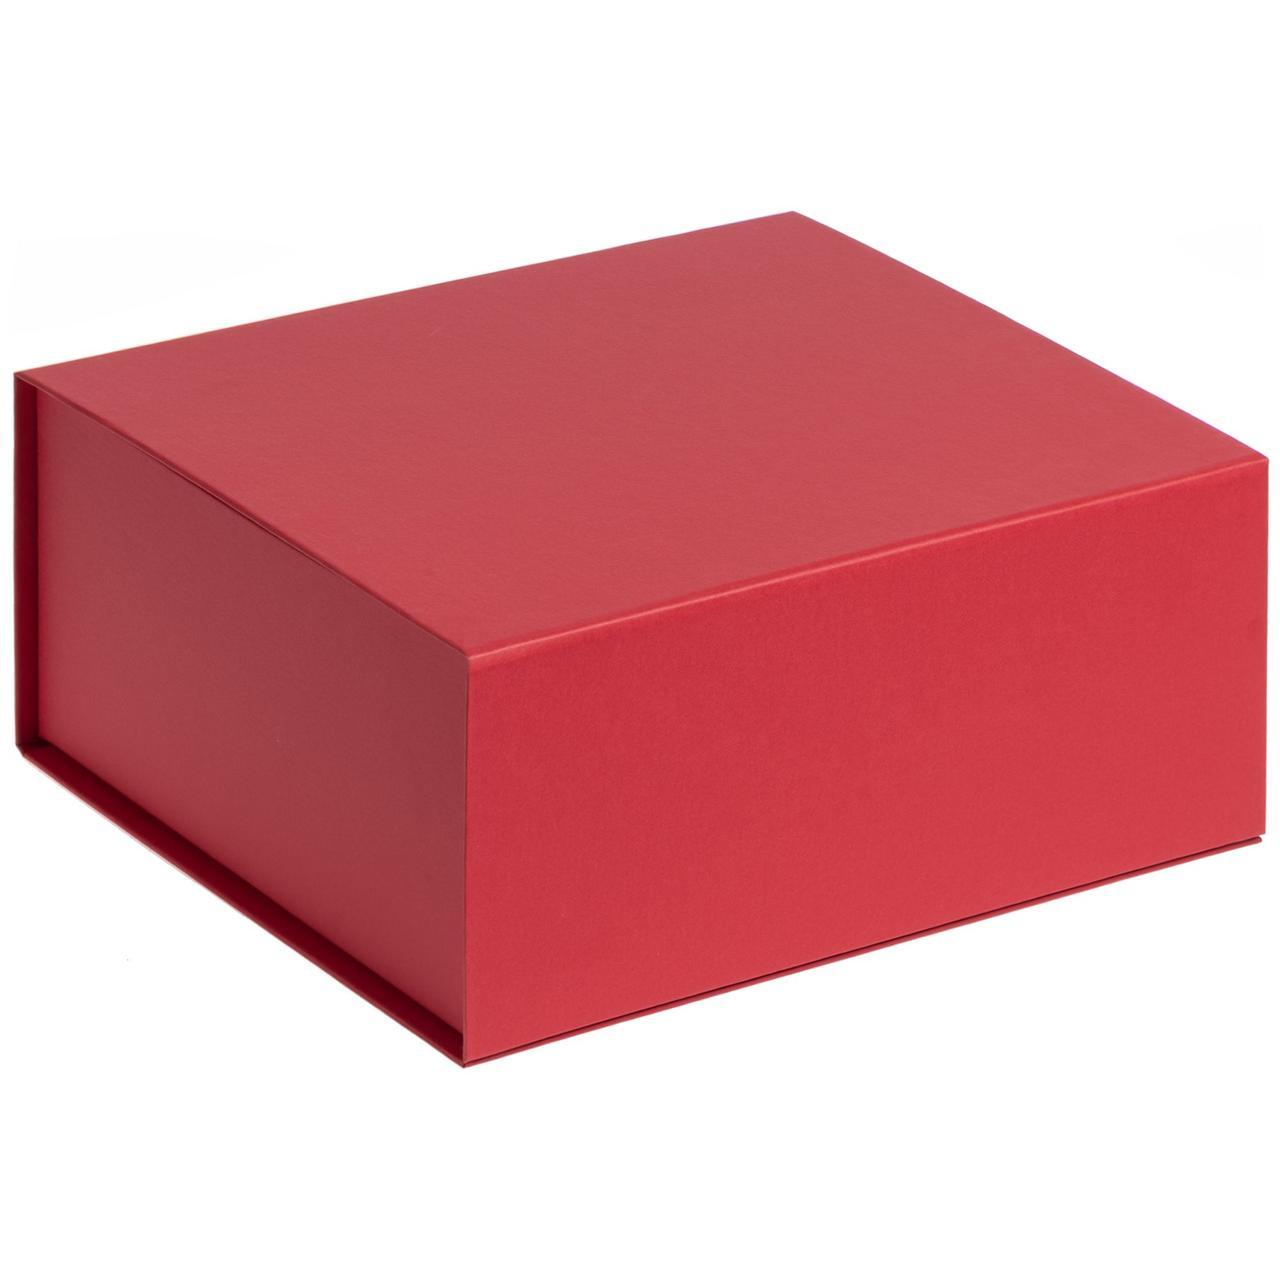 Коробка Amaze, красная (артикул 7586.50)